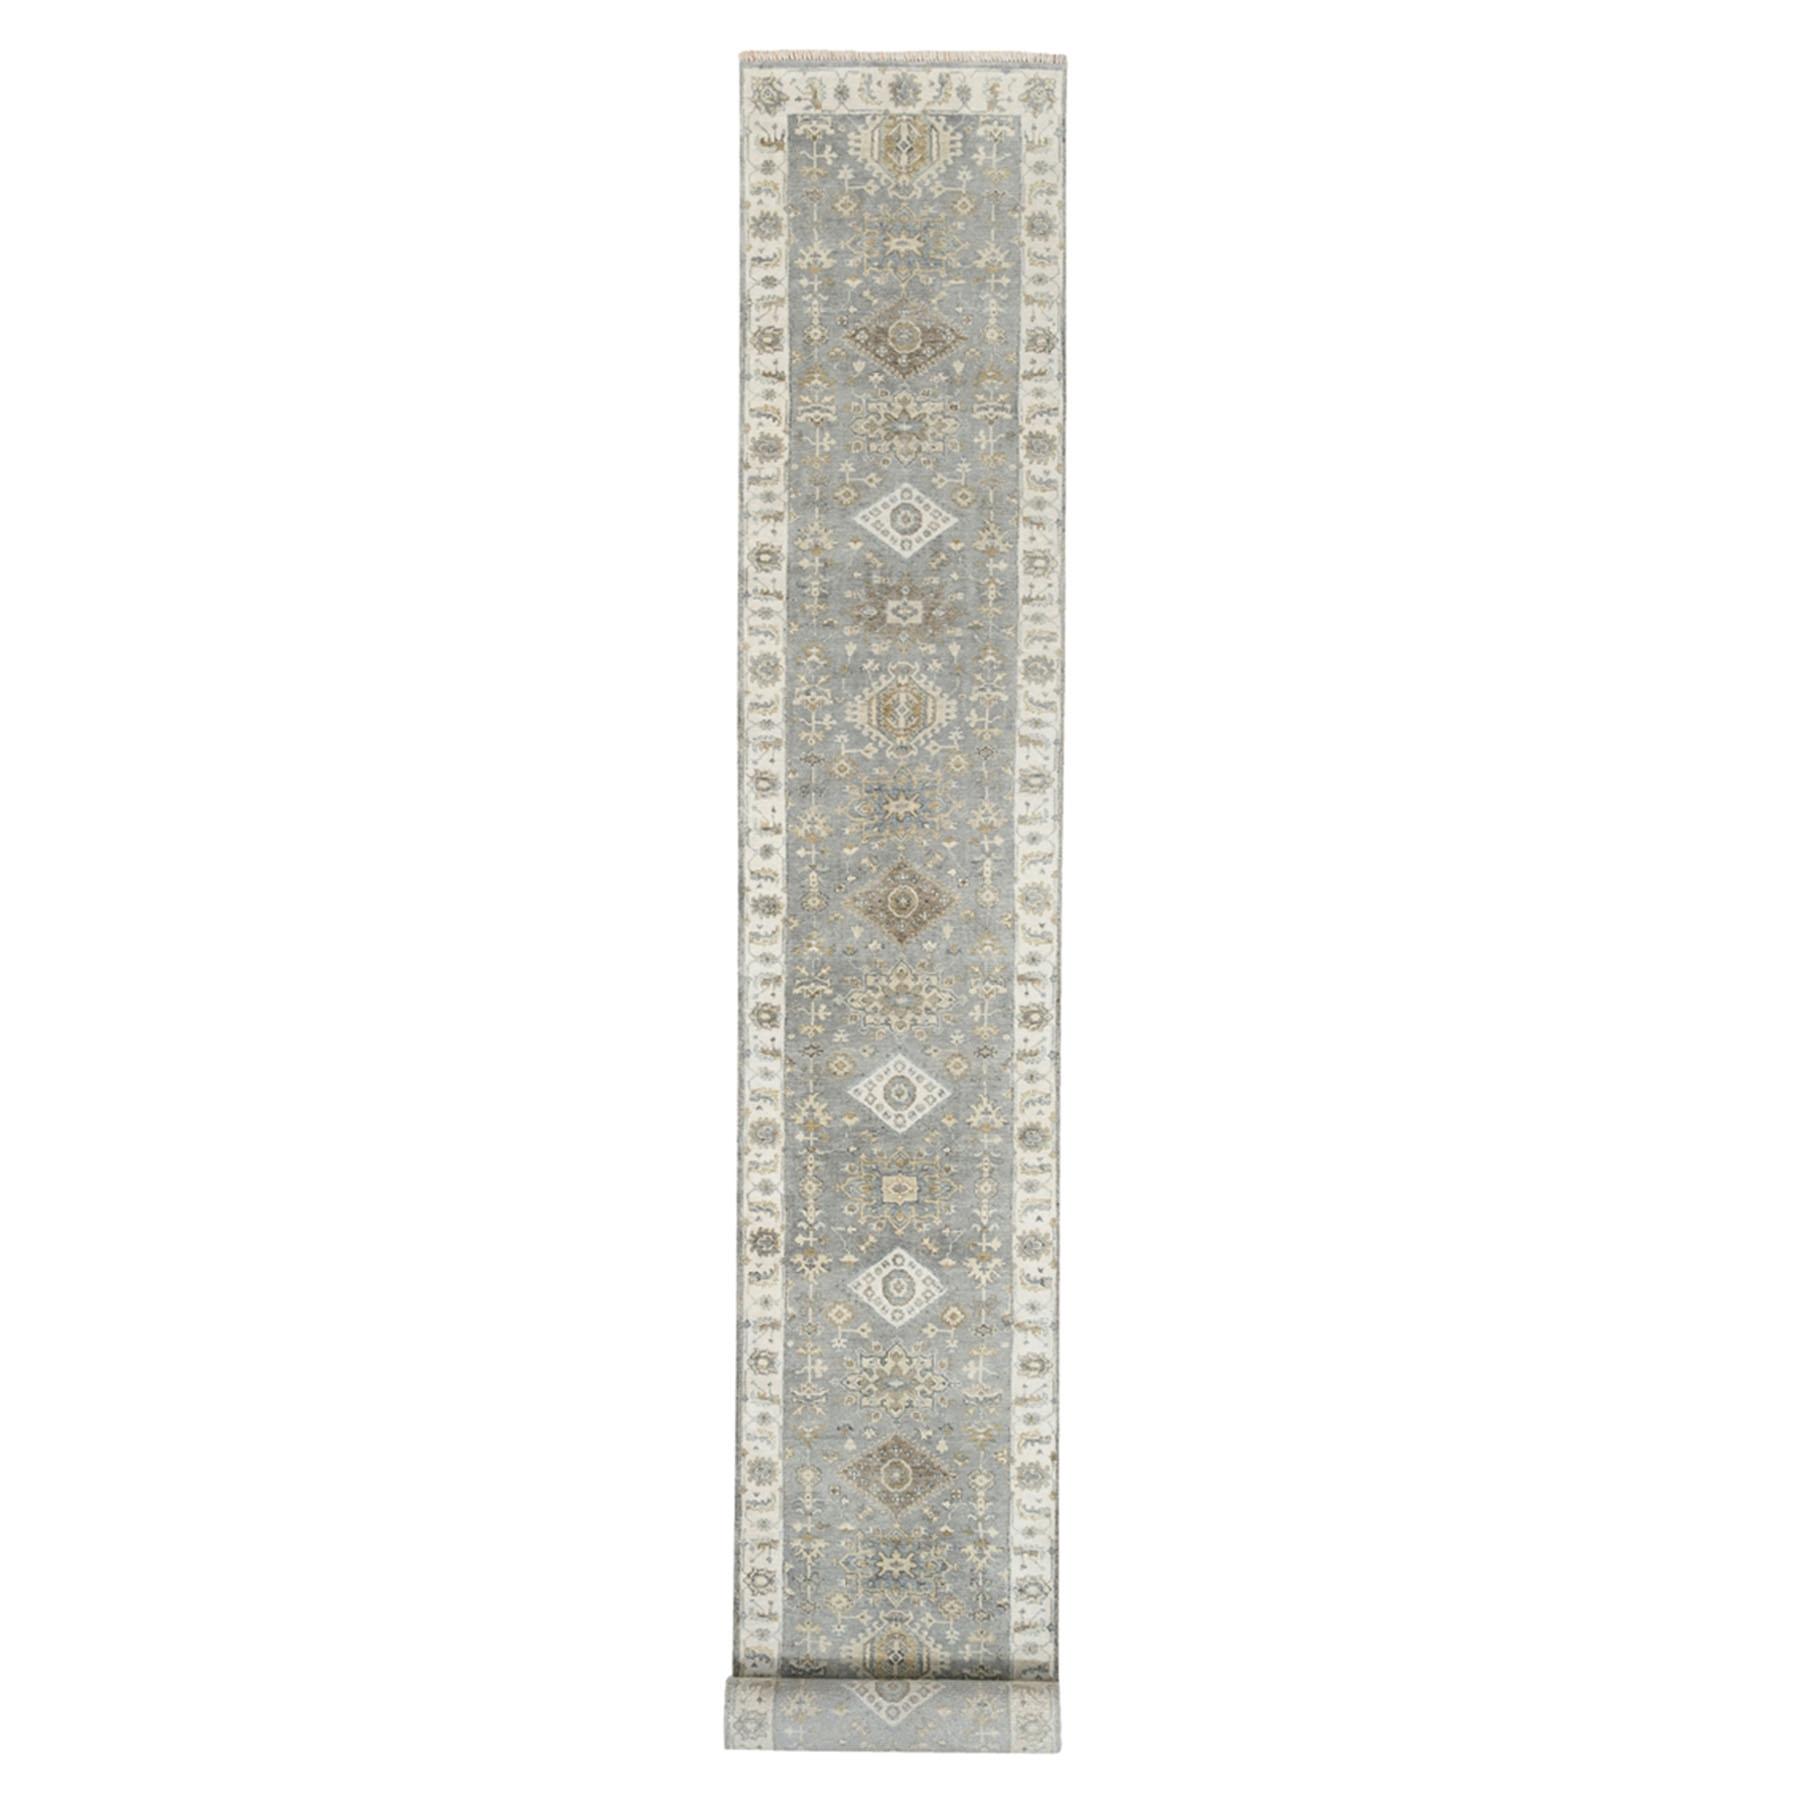 Serapi Heriz and Bakhshayesh Collection Hand Knotted Grey Rug No: 1125292